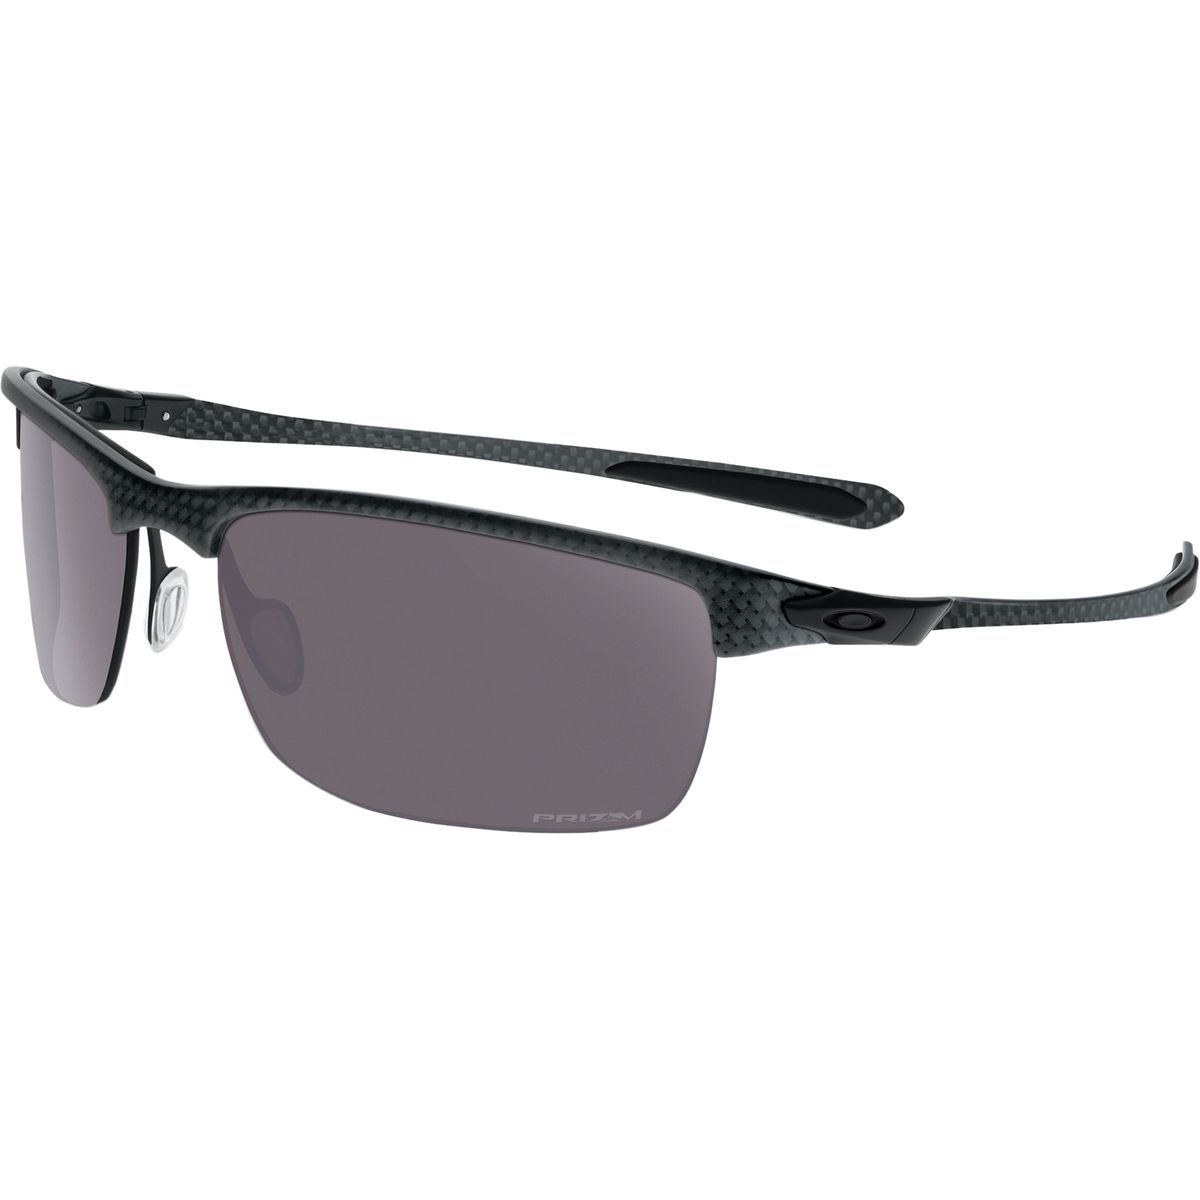 polarized oakley sunglasses u36v  Oakley Carbon Blade Prizm Sunglasses